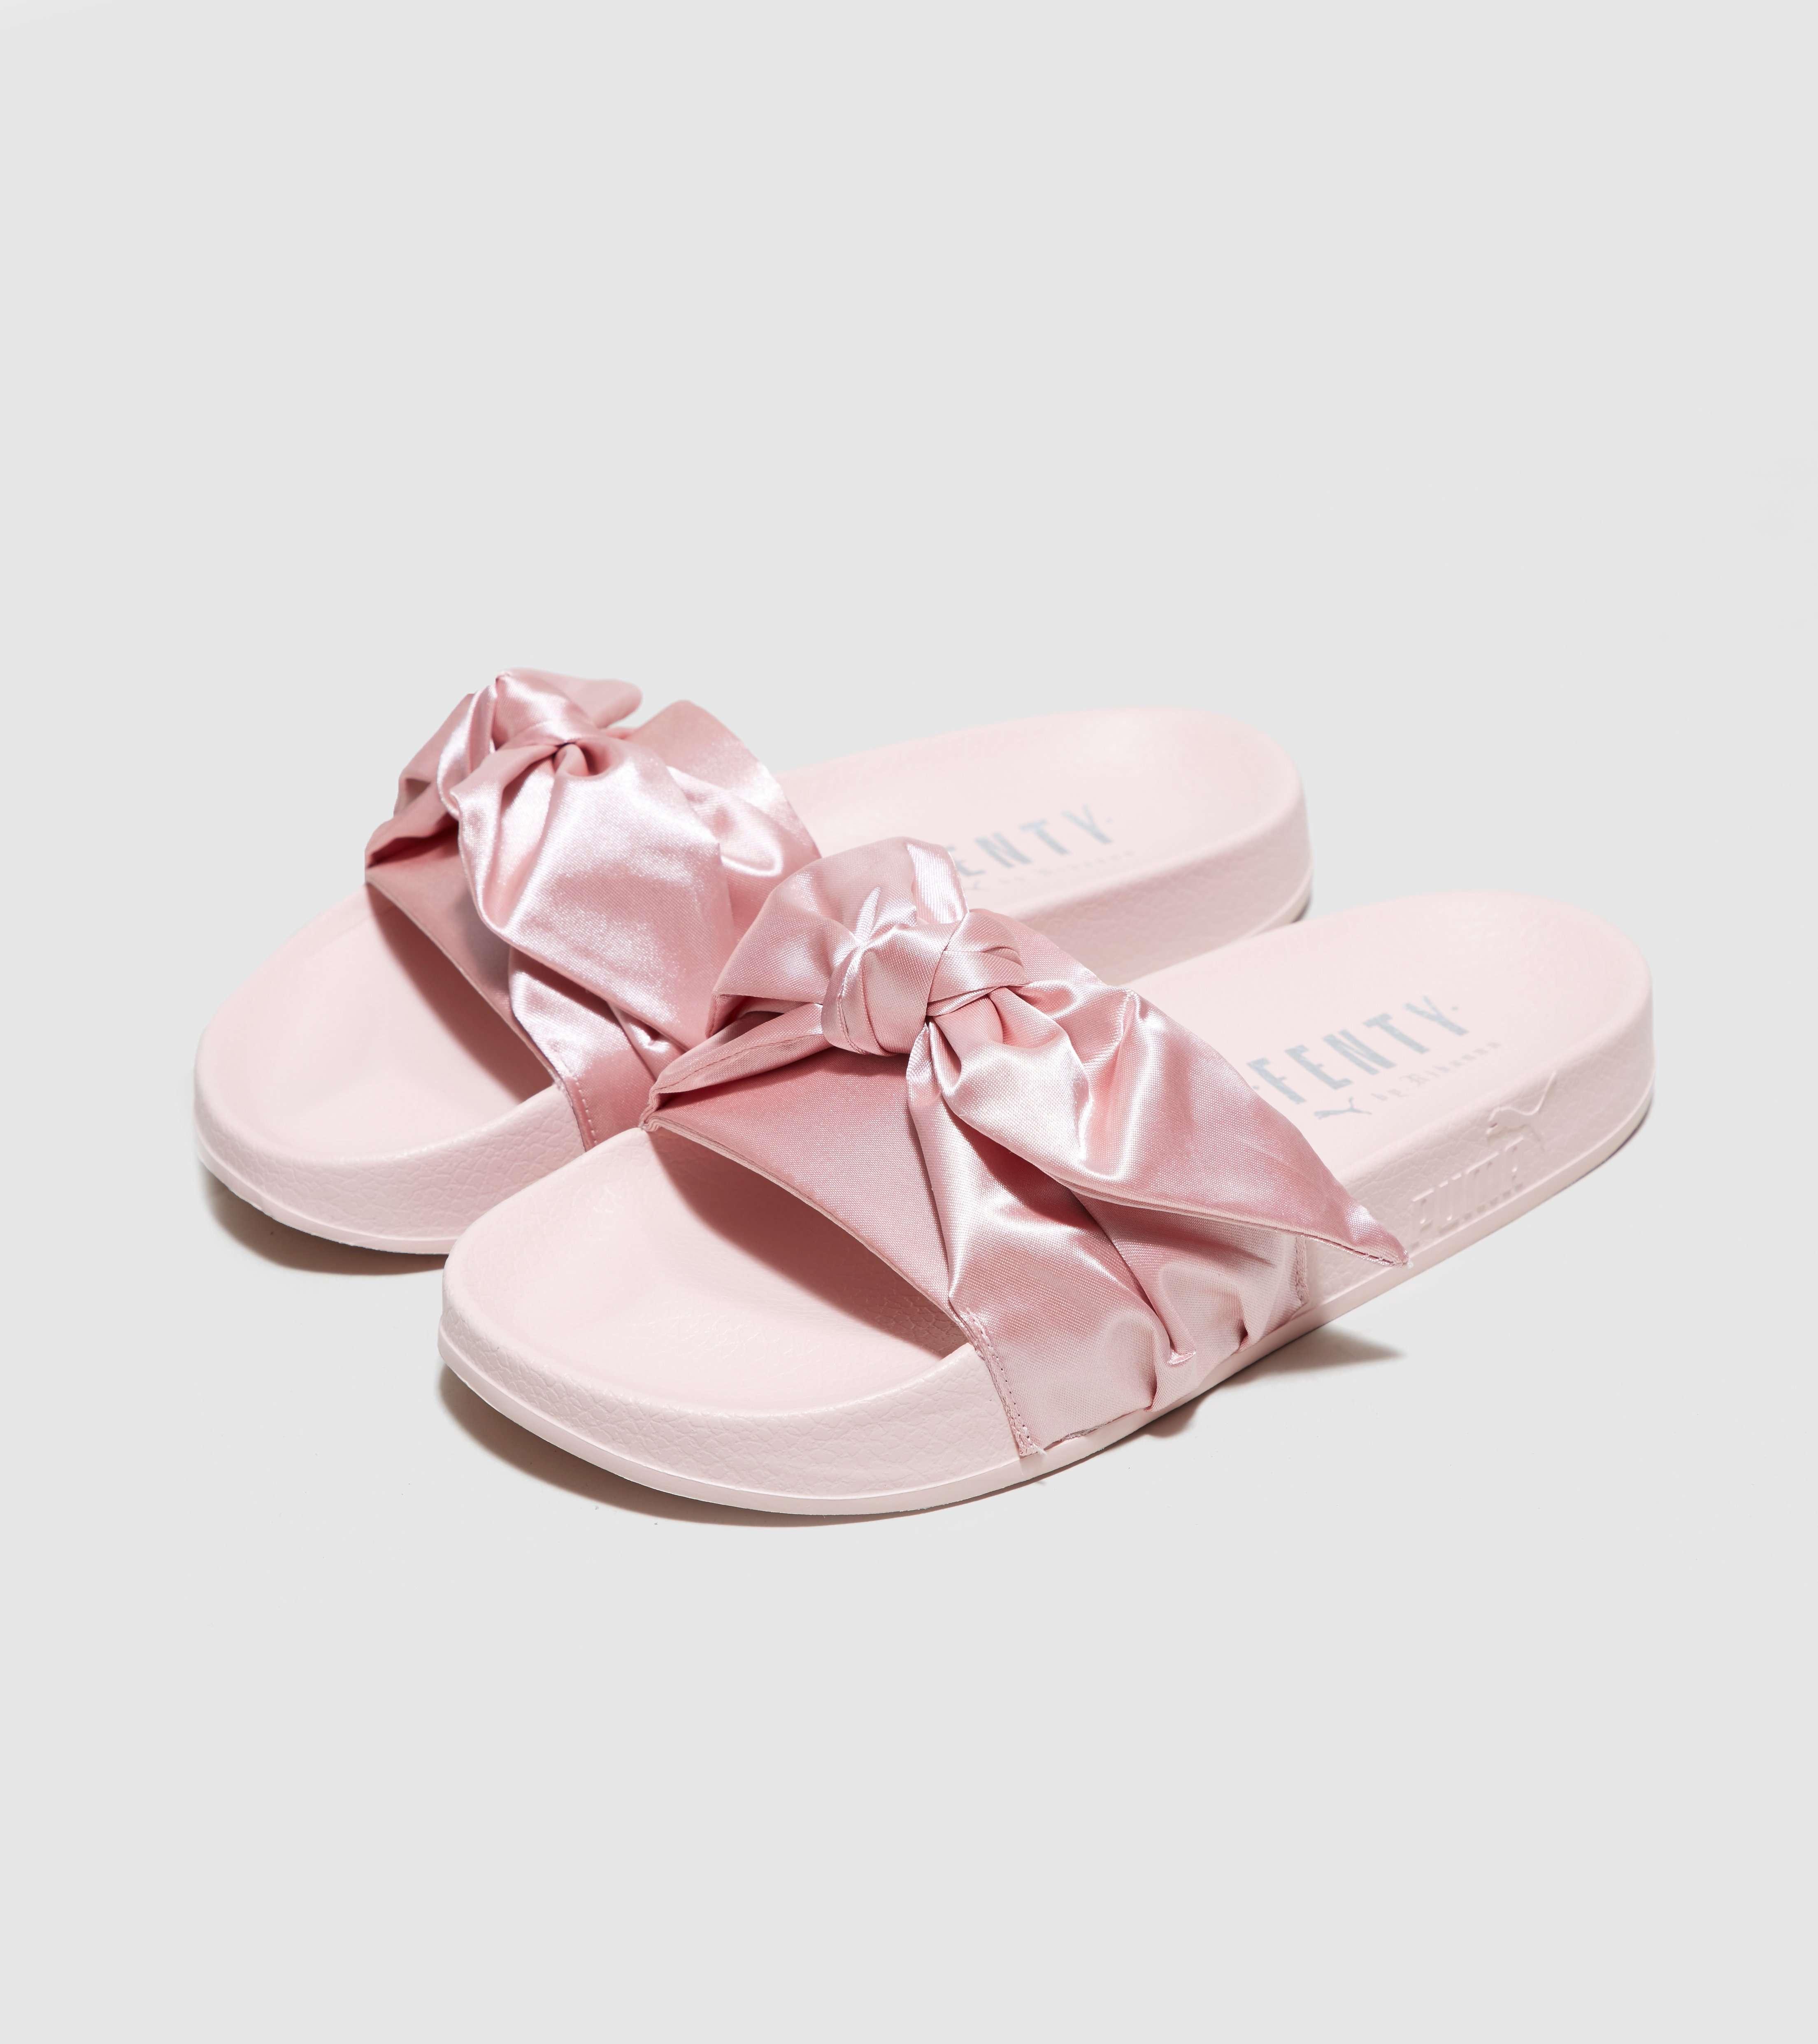 new style ebbb9 ce65b PUMA Fenty Bow Slide Femme | Size?